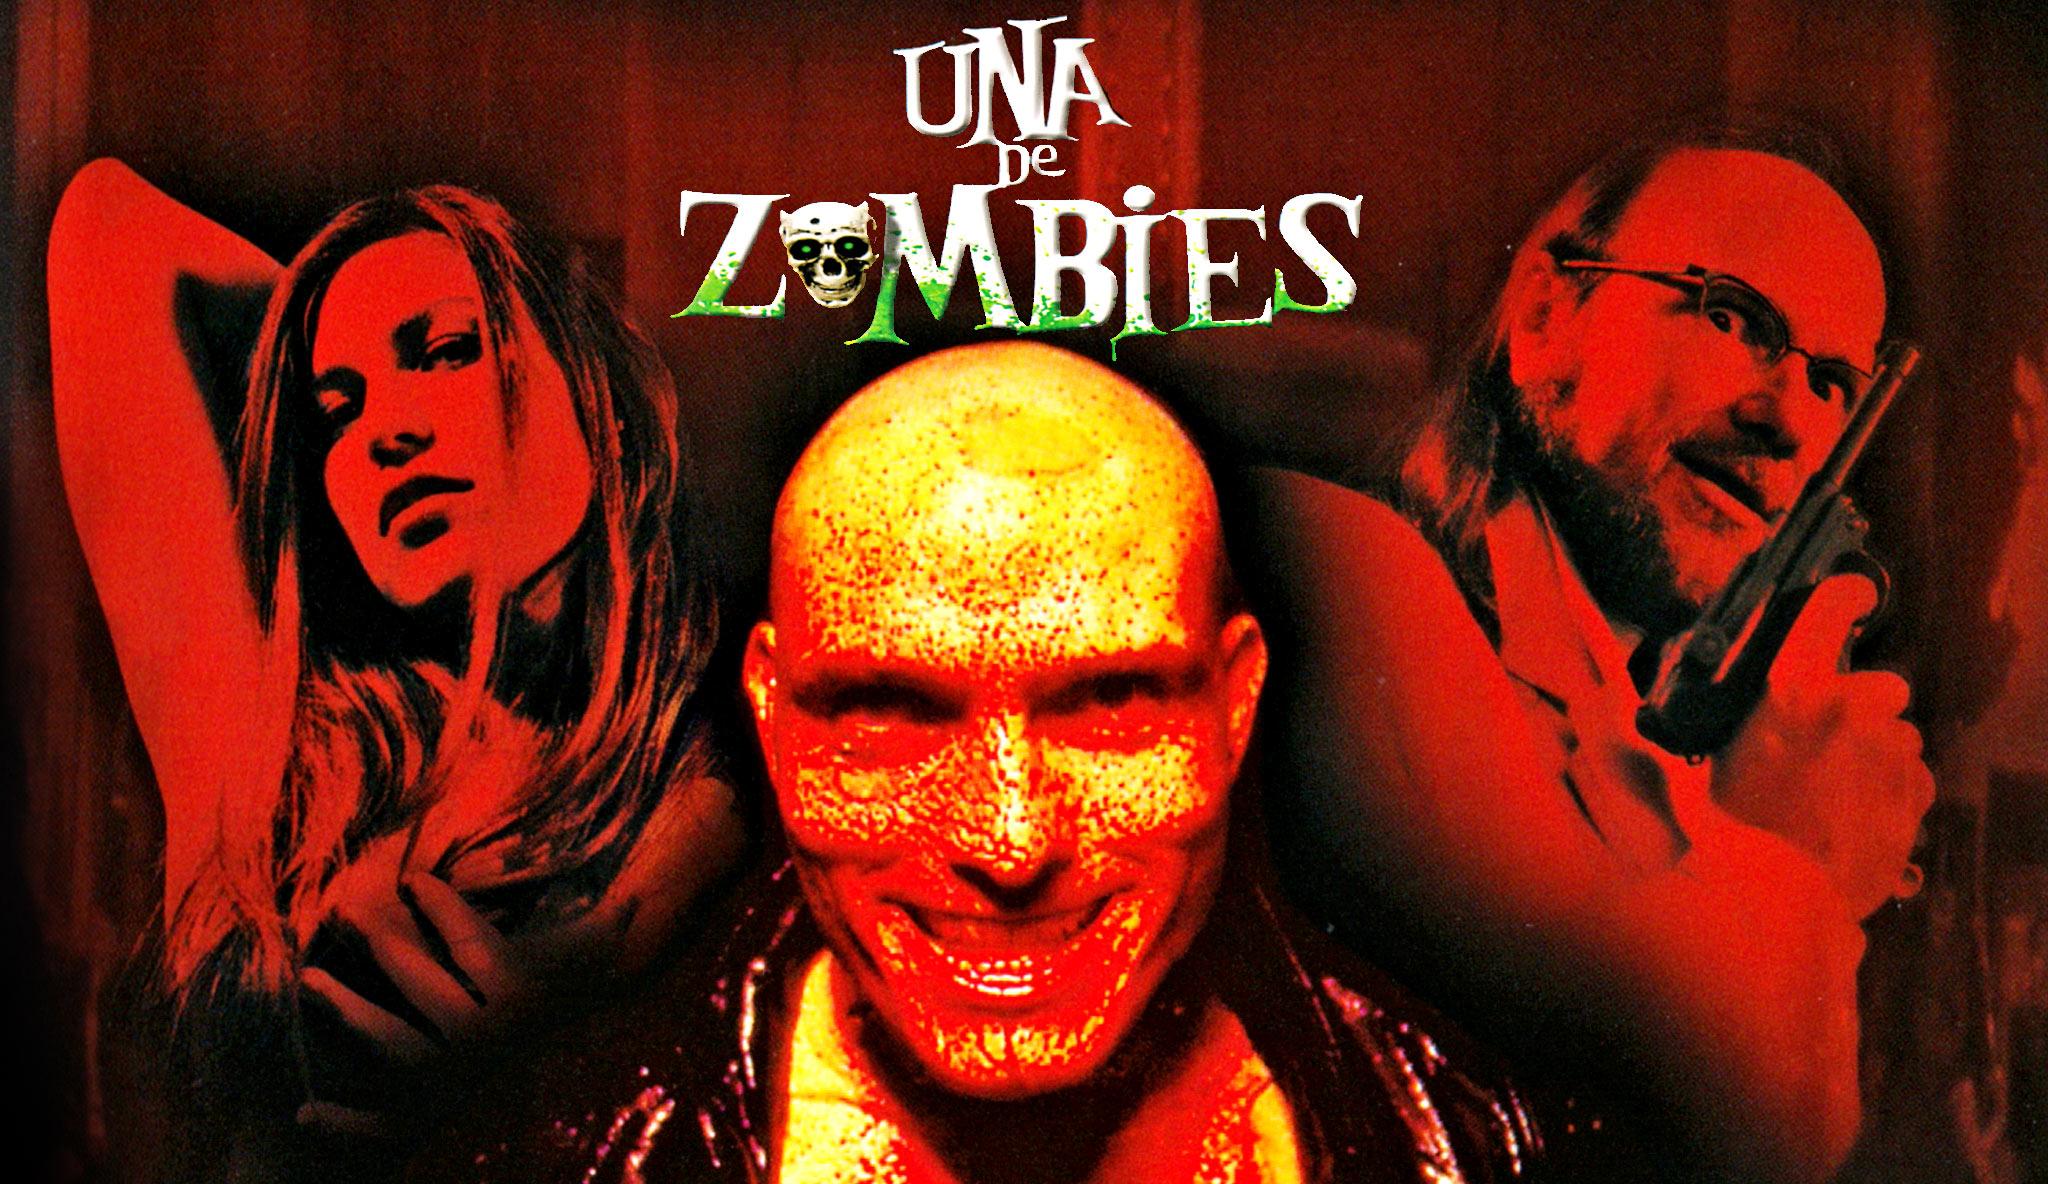 una-de-zombies\header.jpg